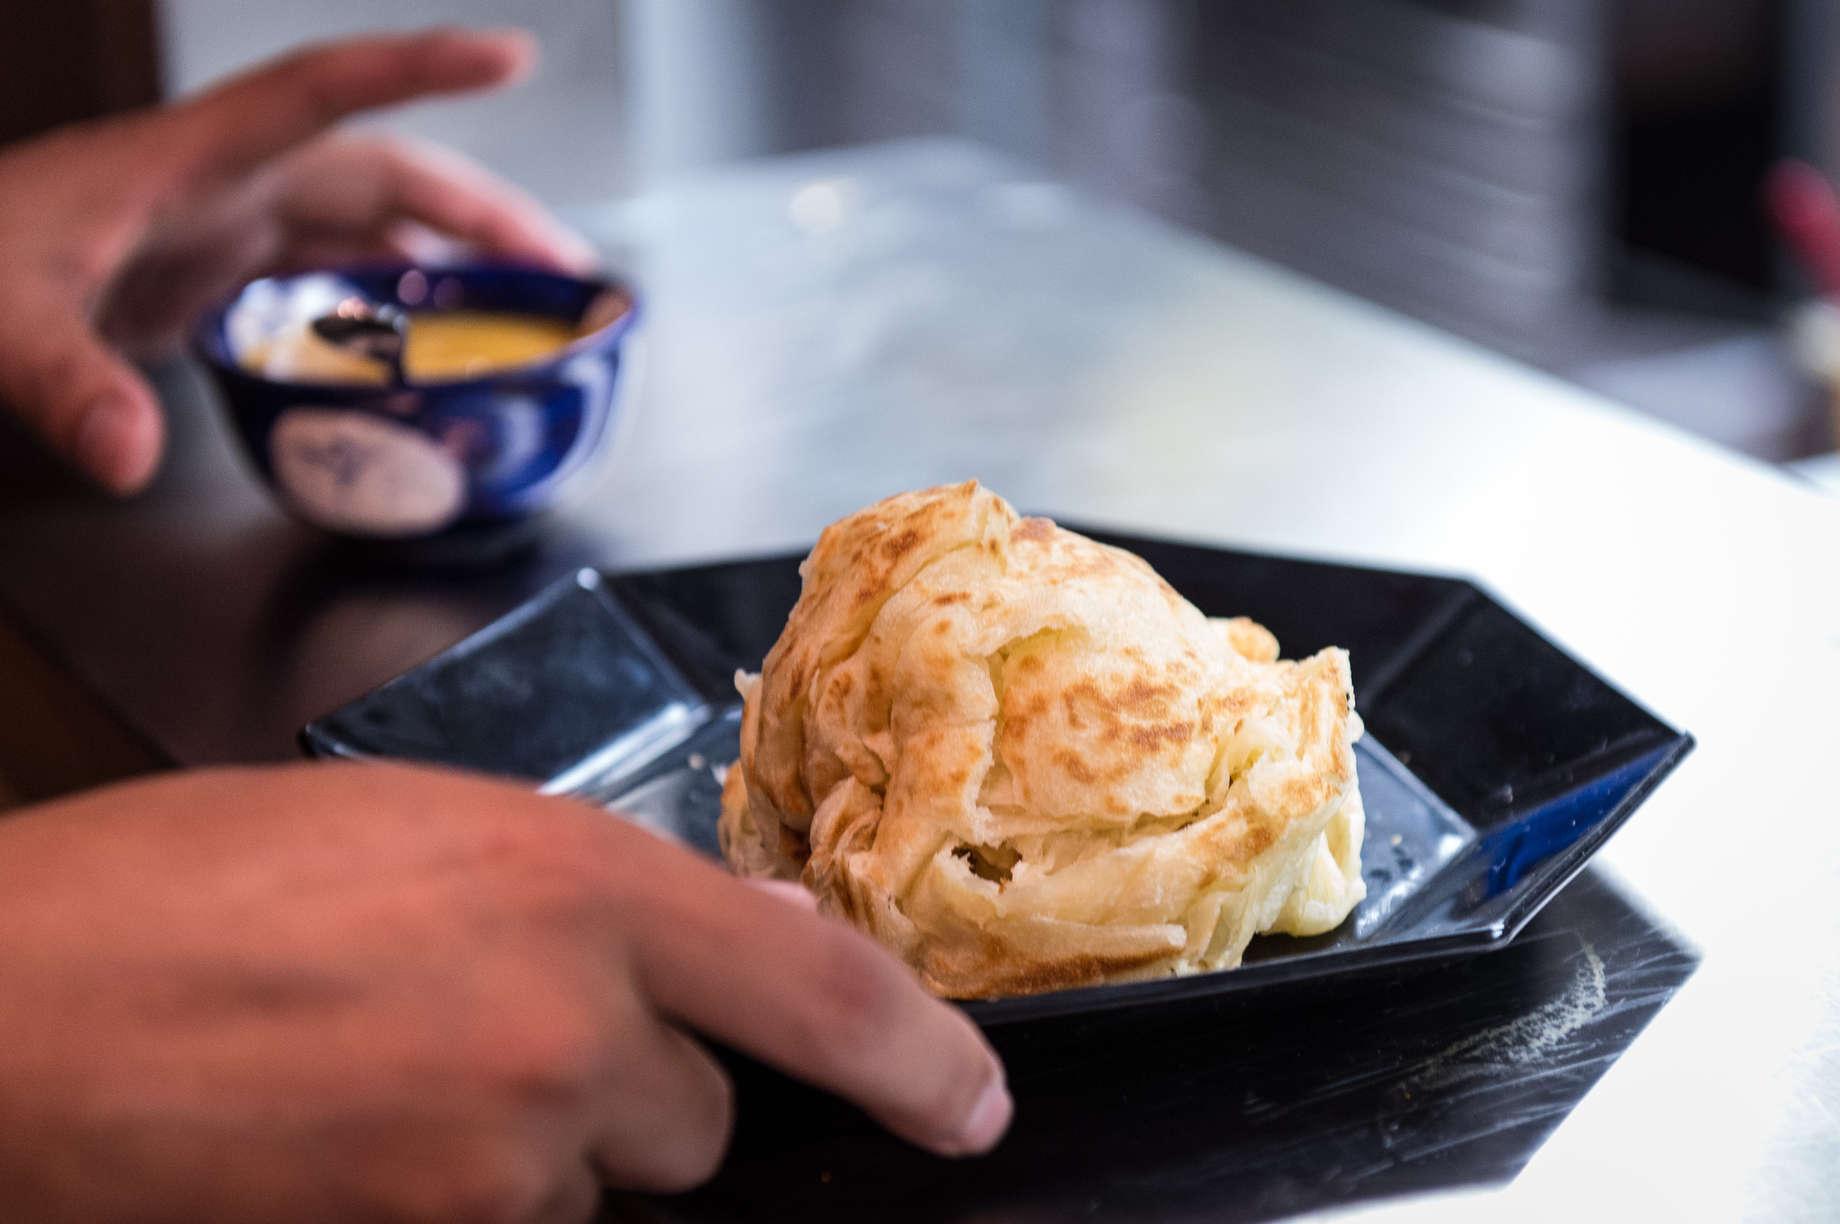 Best Restaurants in Houston: Coolest, Hottest & Newest